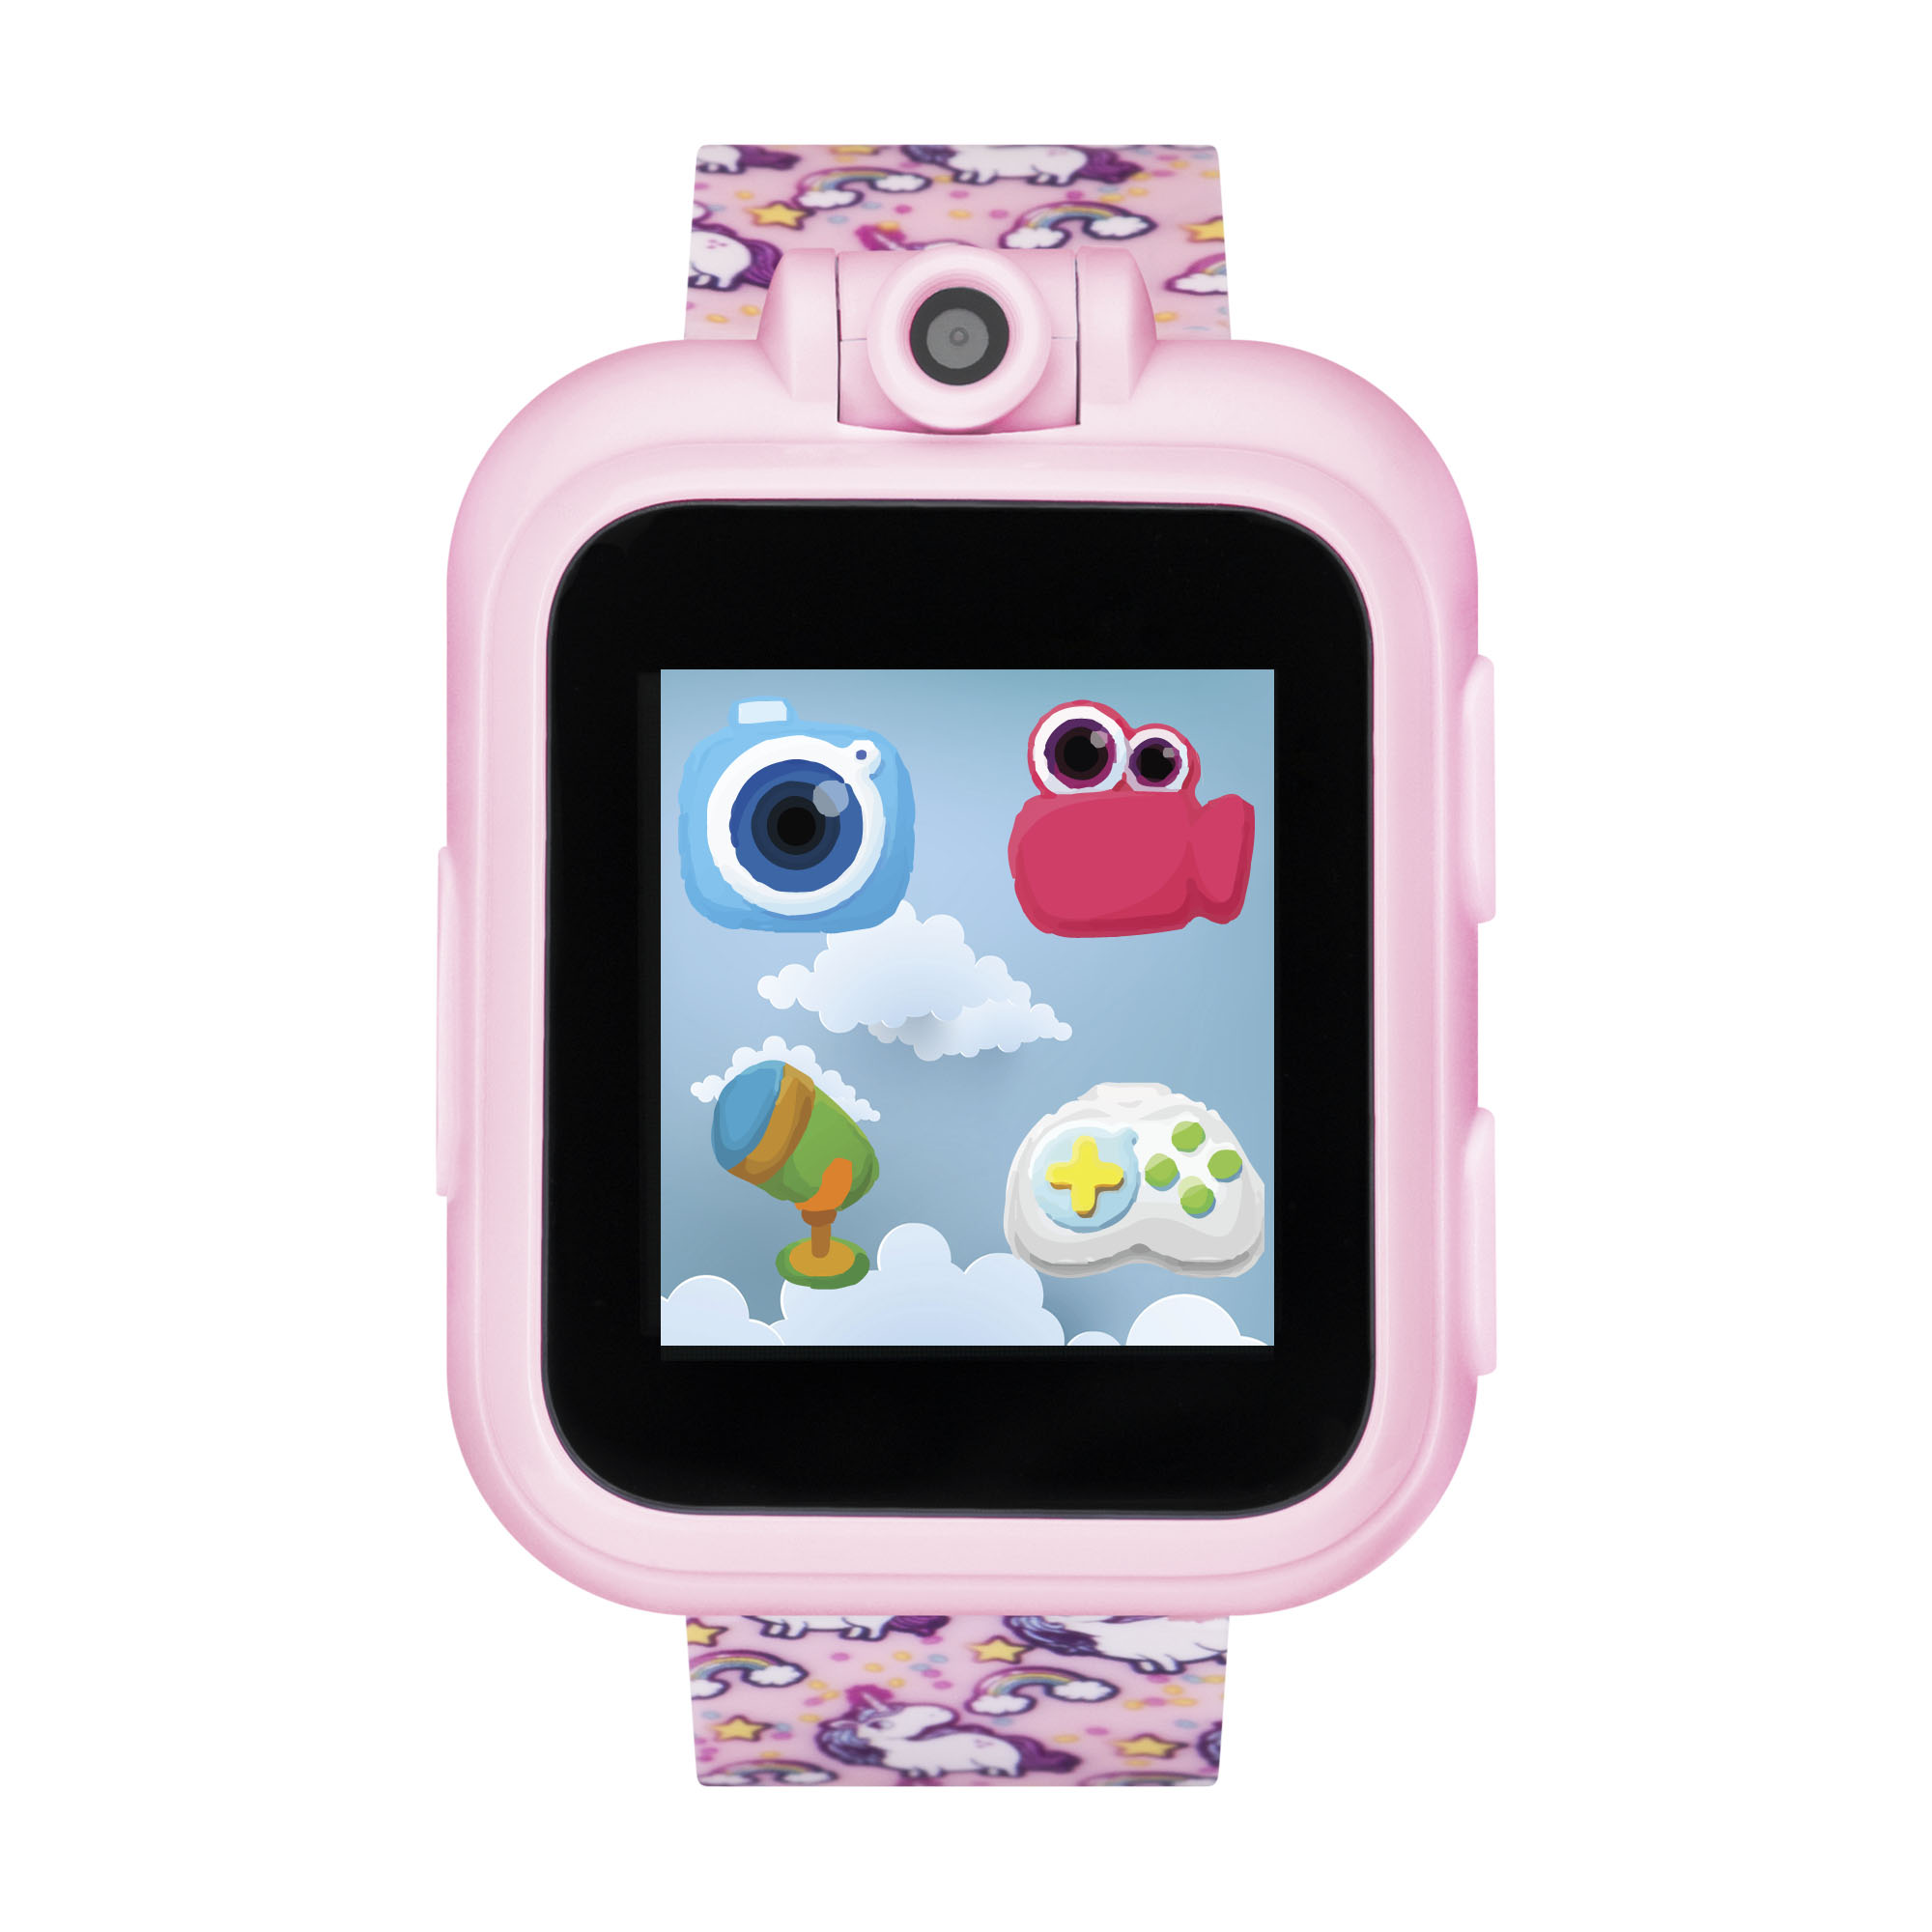 iTech Jr. Kids Smartwatch for Girls - Pink Unicorns